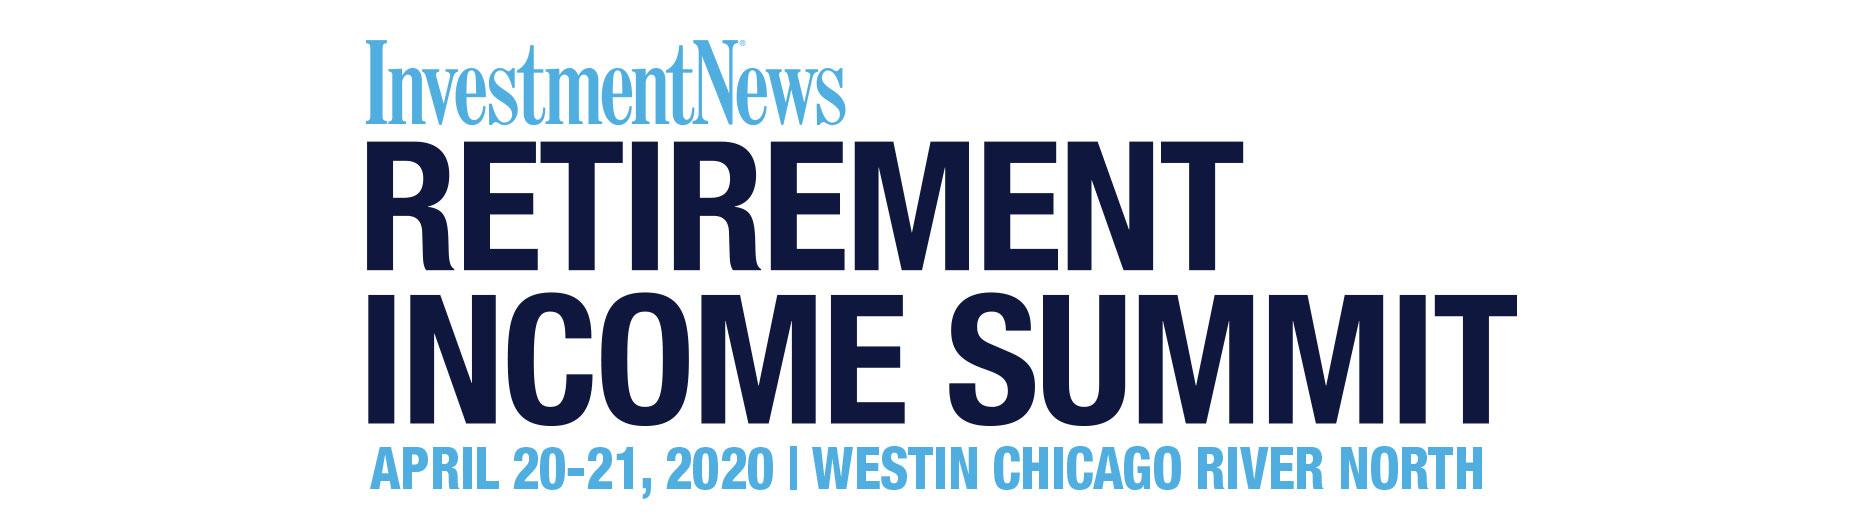 Retirement Income Summit 2020